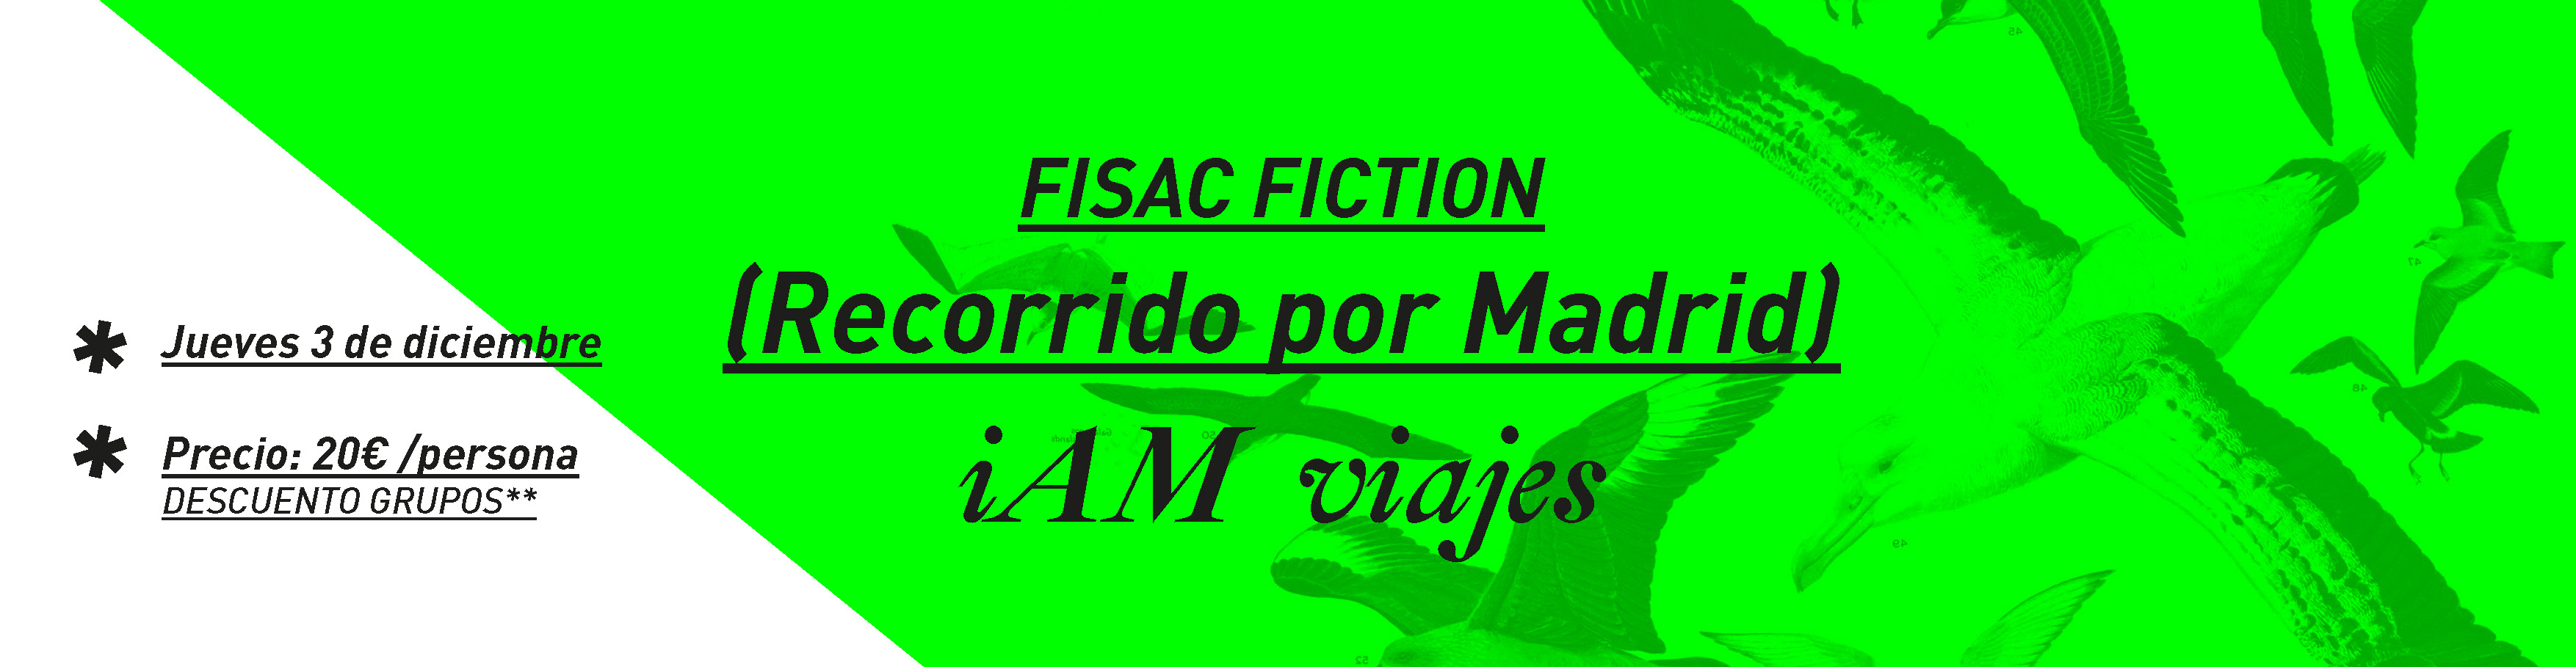 fisacfinal